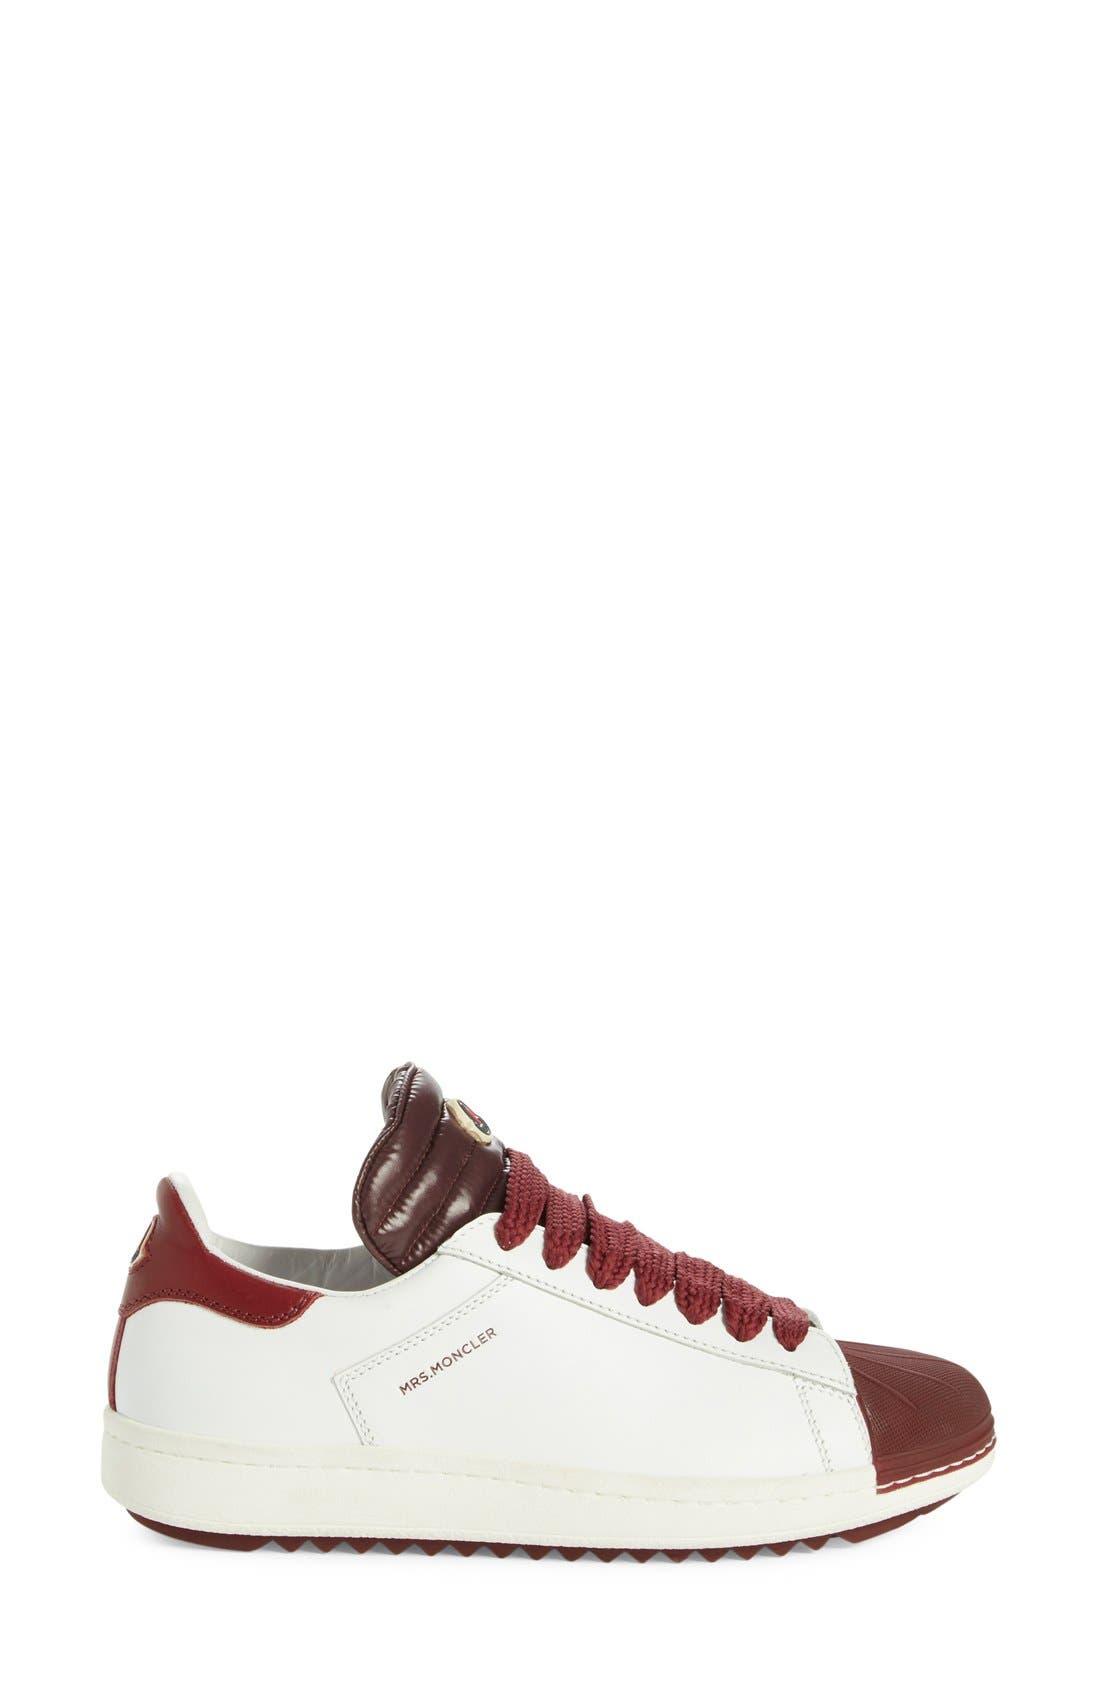 'Angeline Scarpa' Sneaker,                             Alternate thumbnail 4, color,                             Burgundy